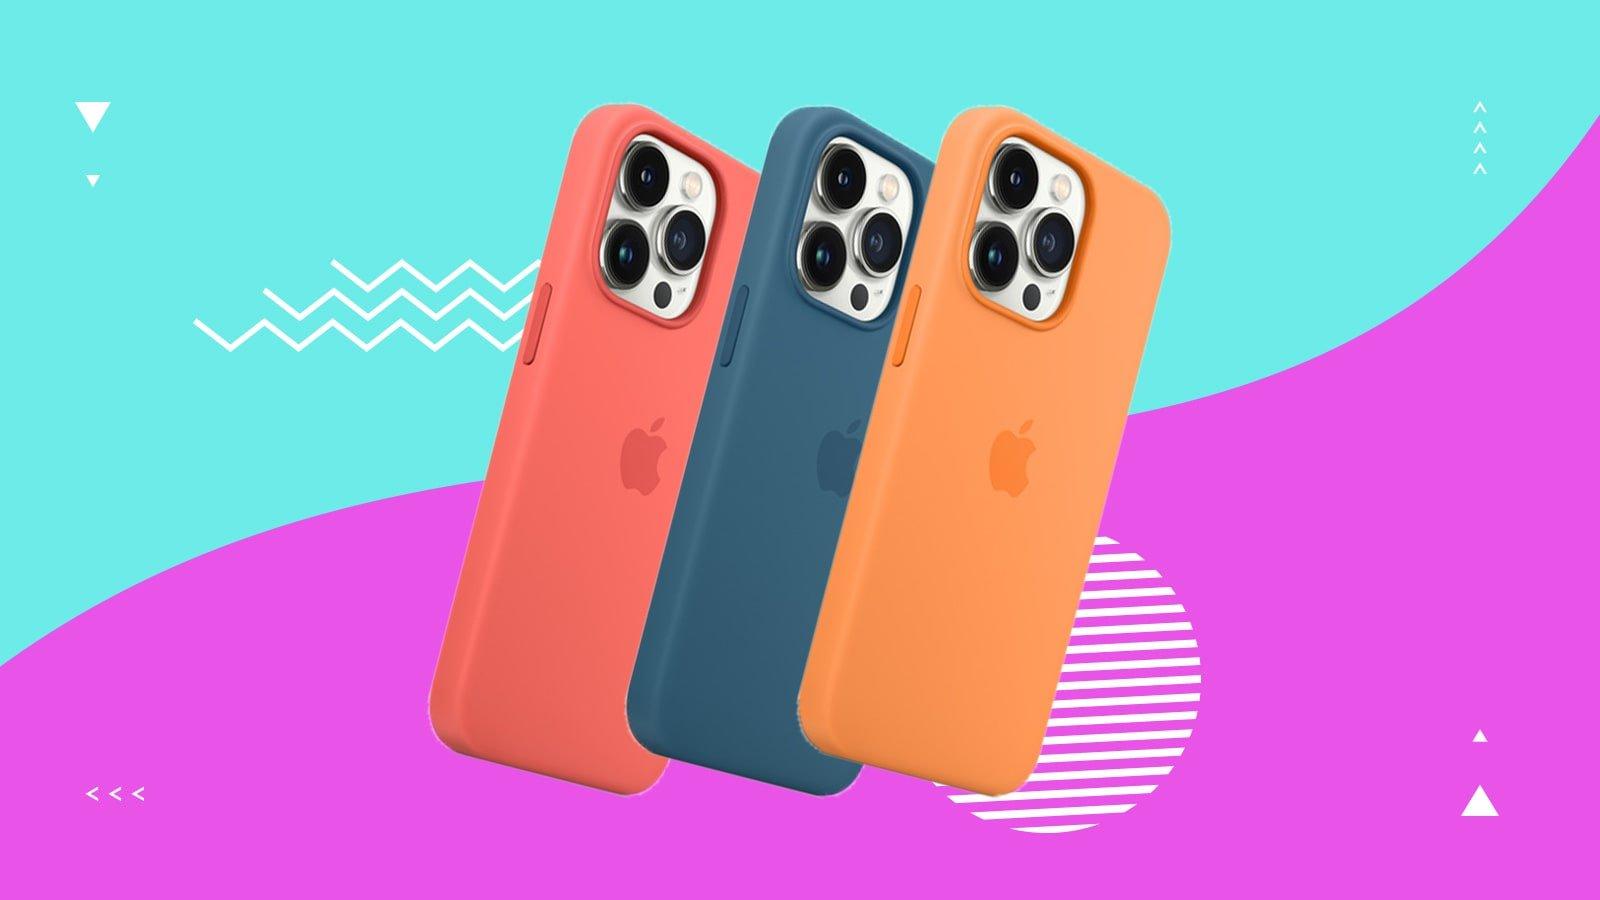 APPLE iPhone 13 | Pro & Max